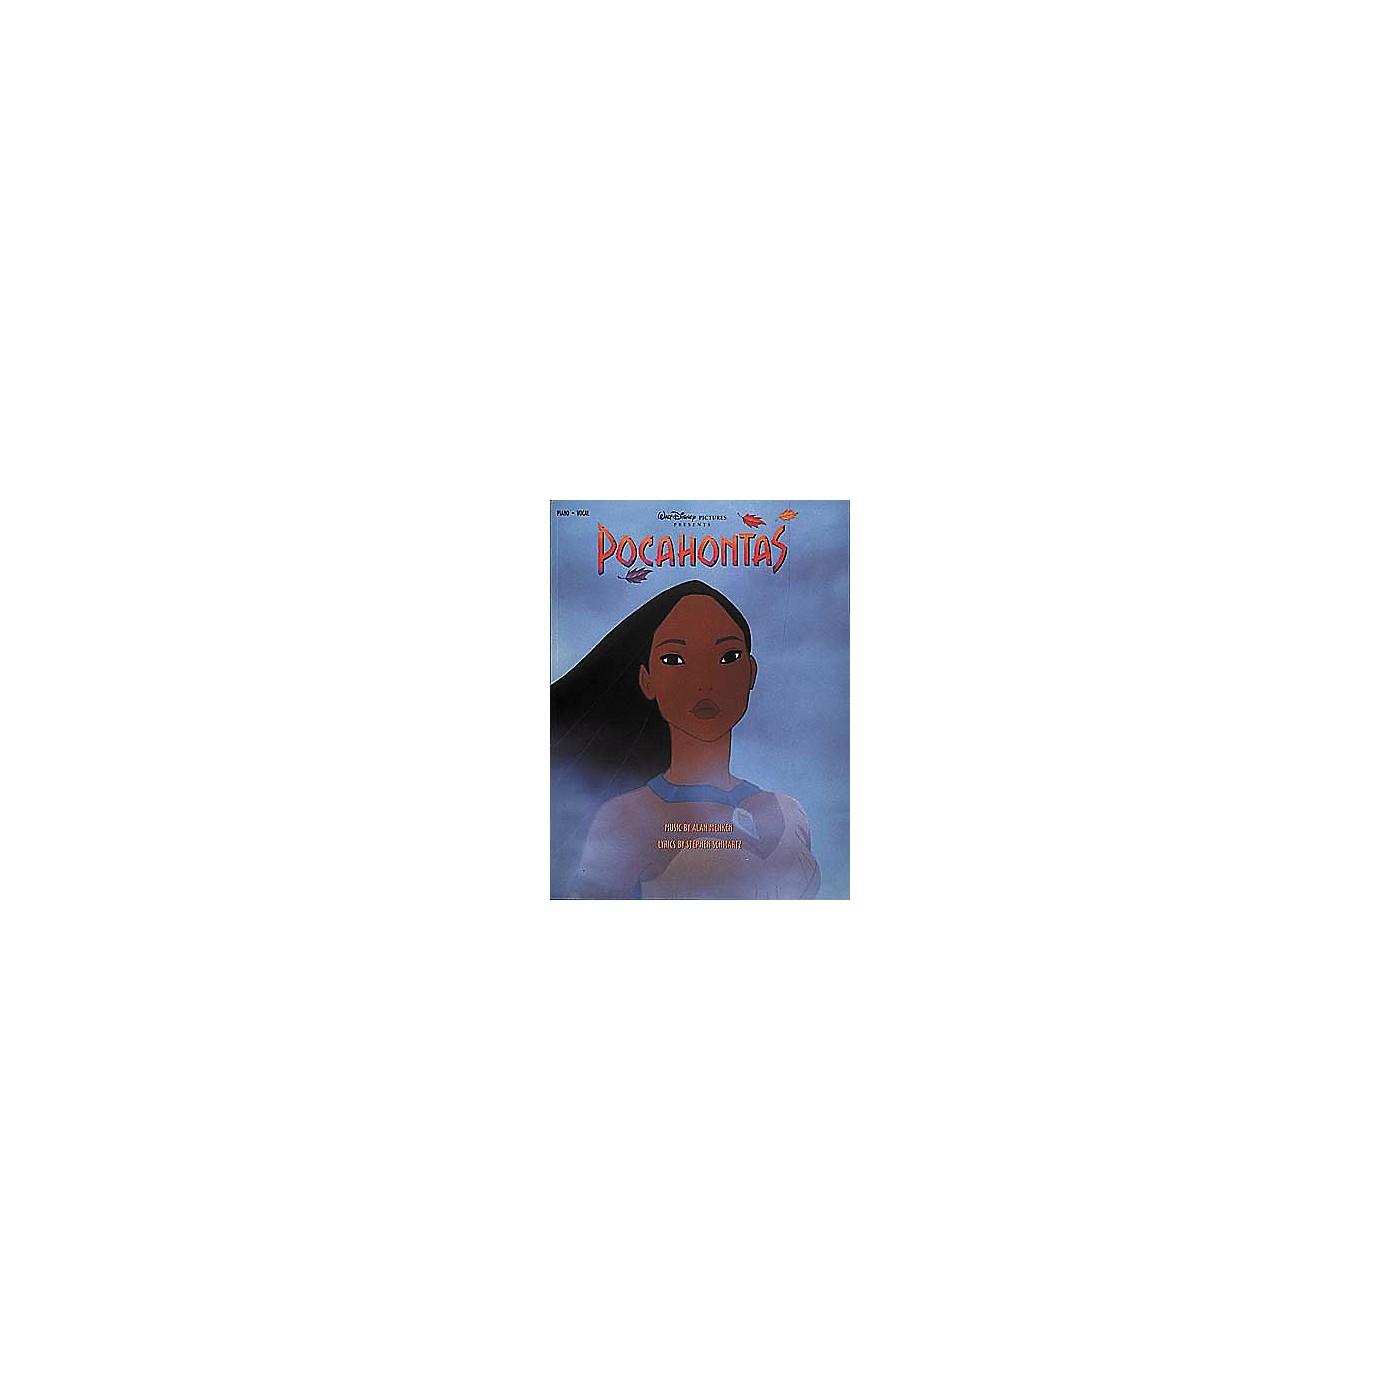 Hal Leonard Pocahontas Piano, Vocal, Guitar Songbook thumbnail